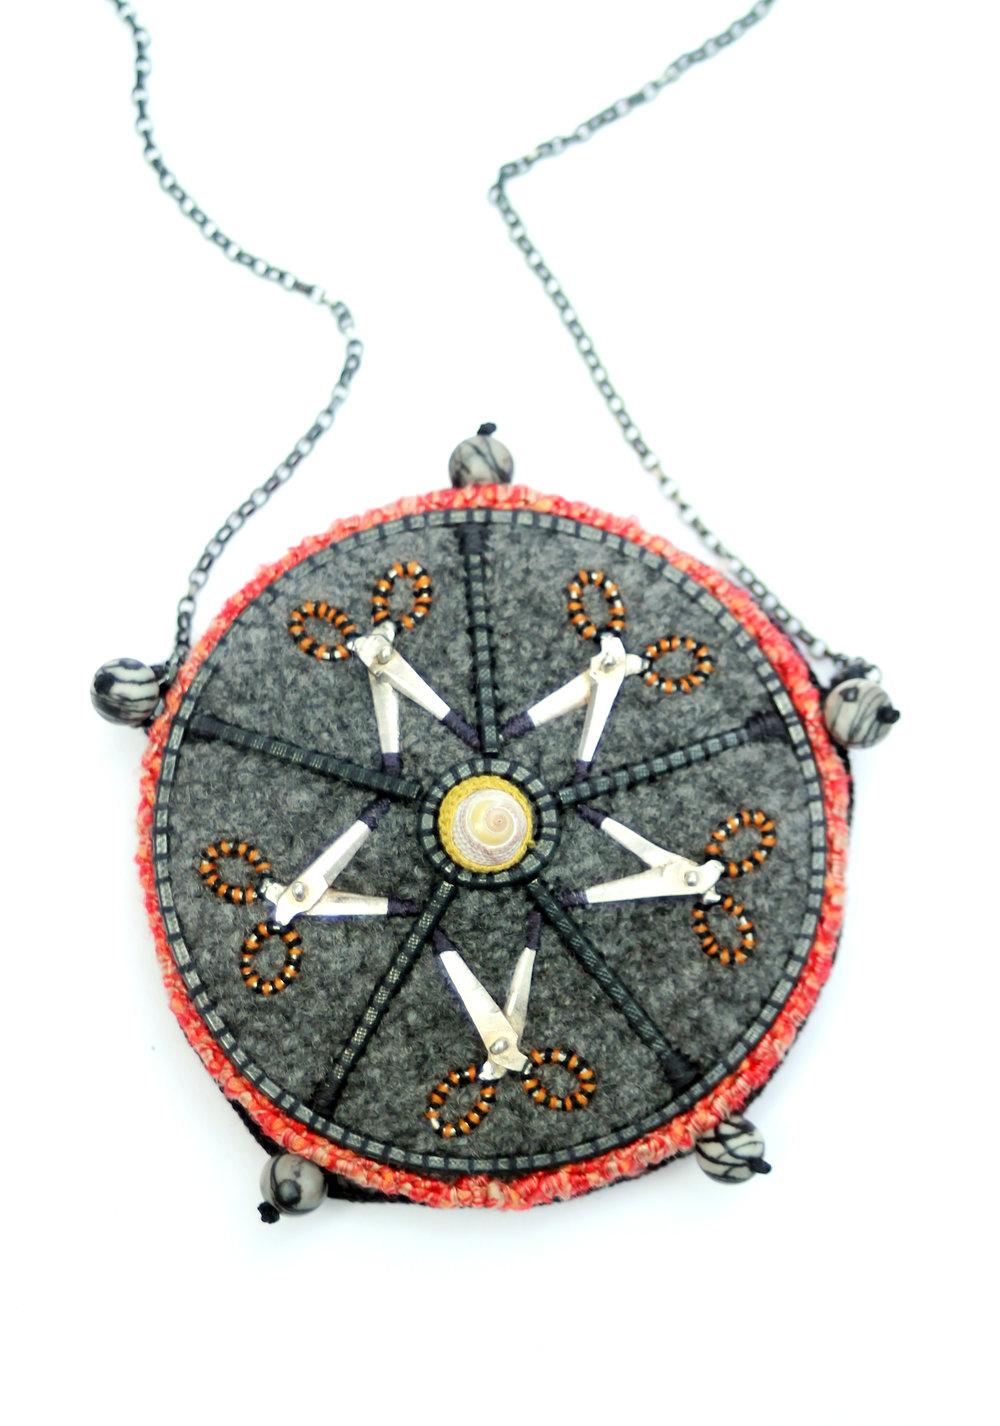 10.Wheel of Life - for Patricia Highsmith 02.jpg